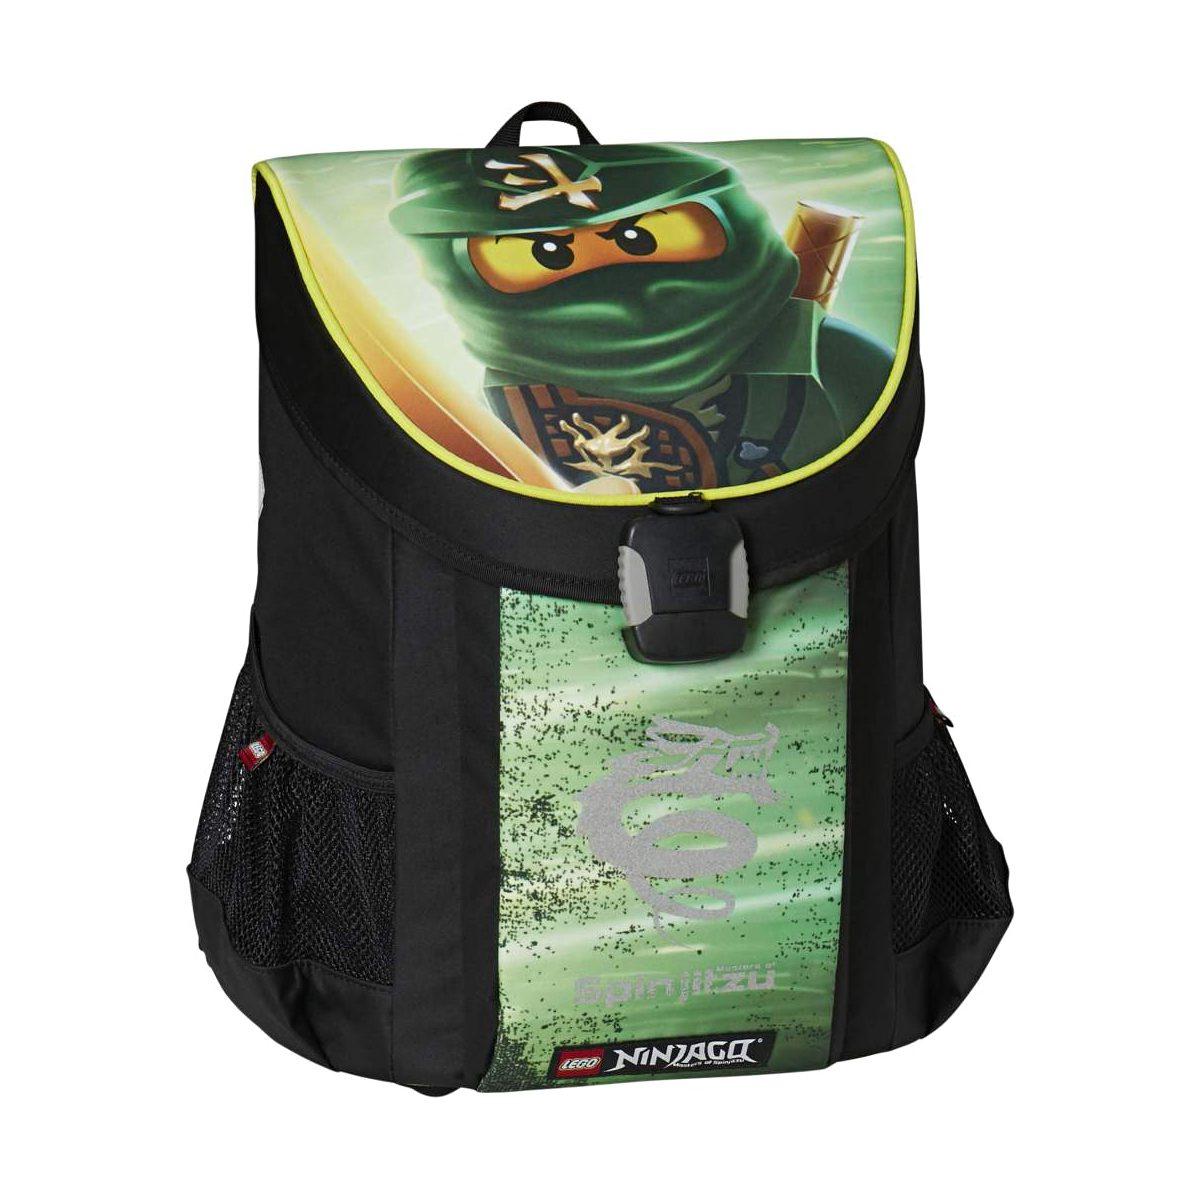 Ghiozdan Pentru Şcoală, NinjaGo Lloyd, Easy, Core Line, Verde, Lego, LG-20043-1717